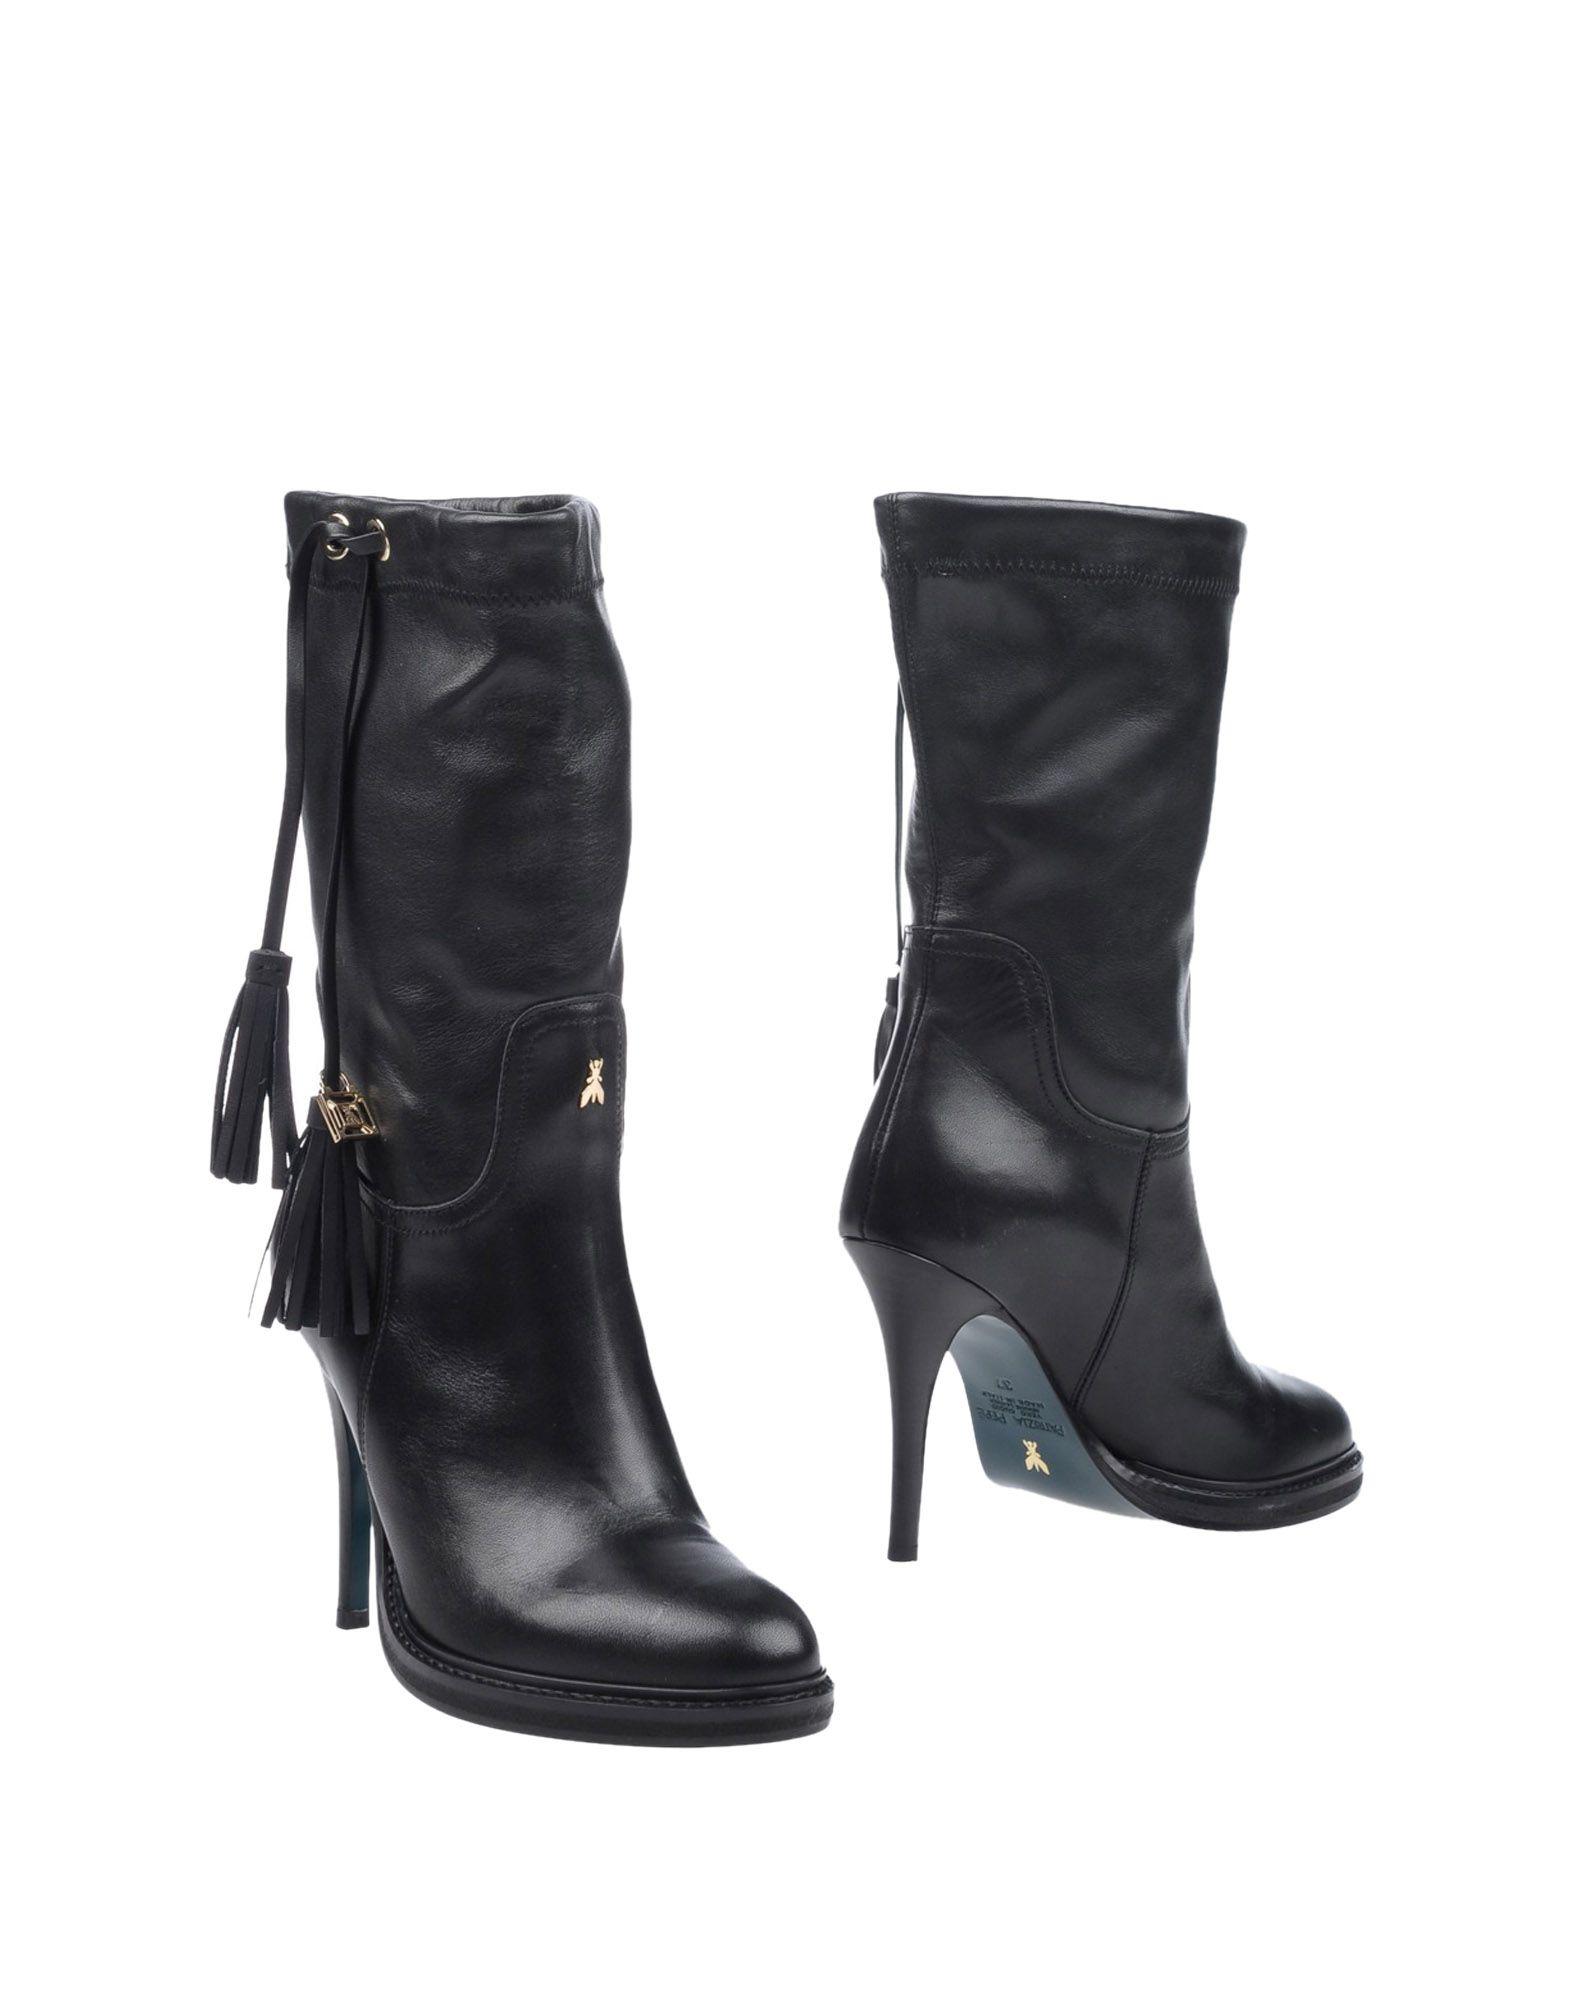 Rabatt Schuhe  Patrizia Pepe Stiefelette Damen  Schuhe 11297650LH de09f2